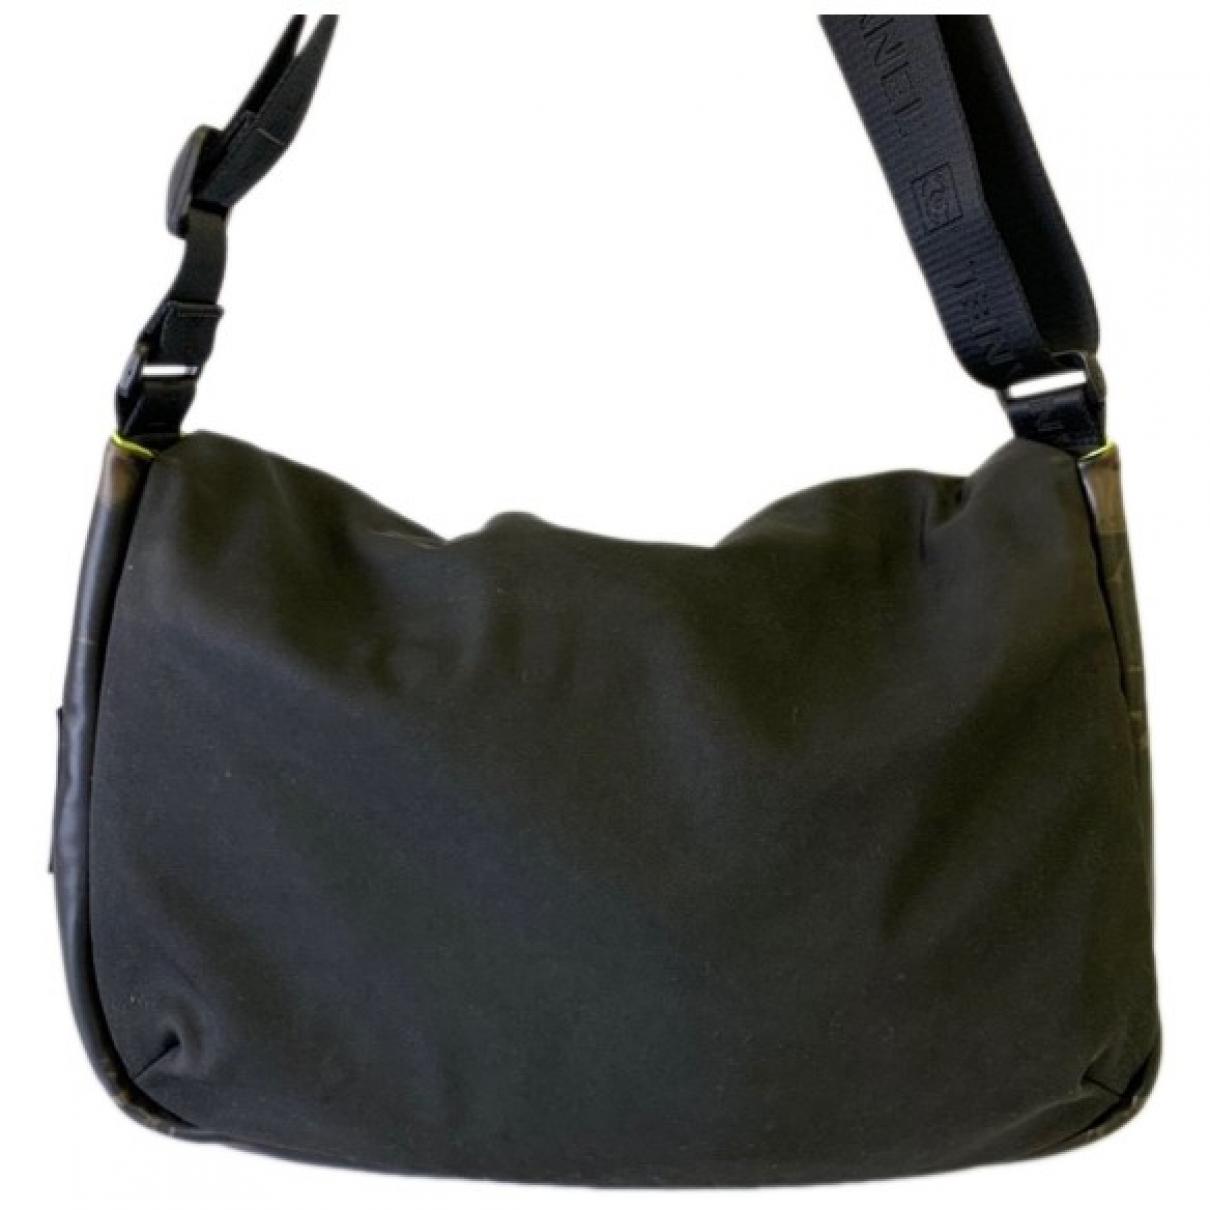 Chanel \N Multicolour handbag for Women \N